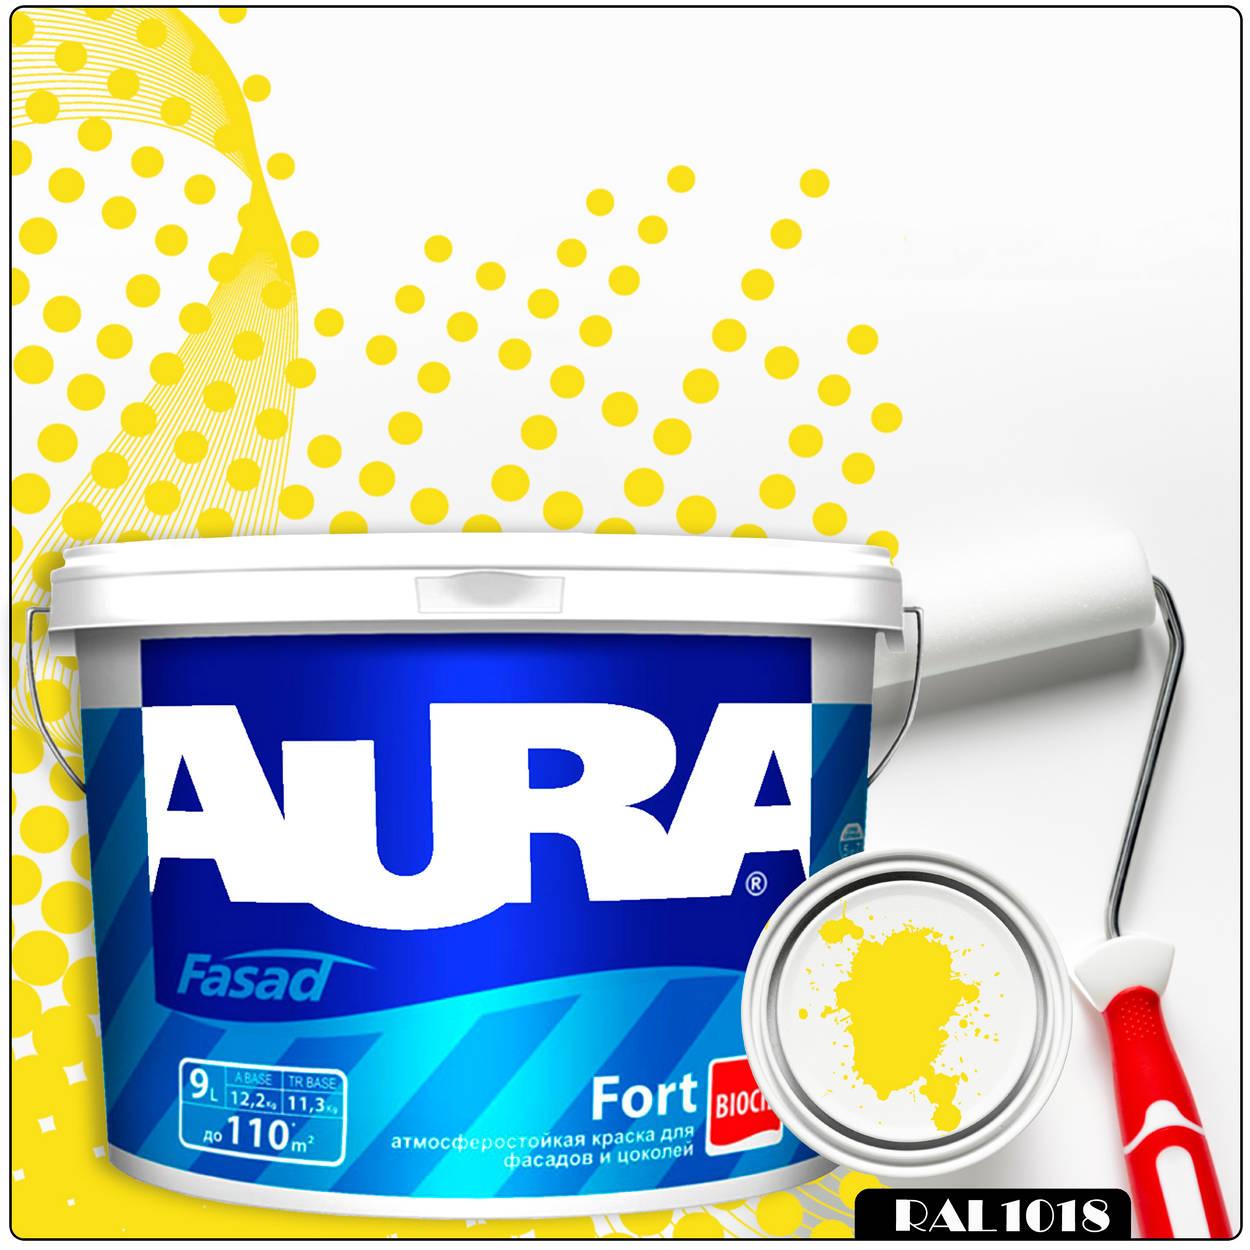 Фото 16 - Краска Aura Fasad Fort, RAL 1018 Цинково-жёлтый, латексная, матовая, для фасада и цоколей, 9л, Аура.